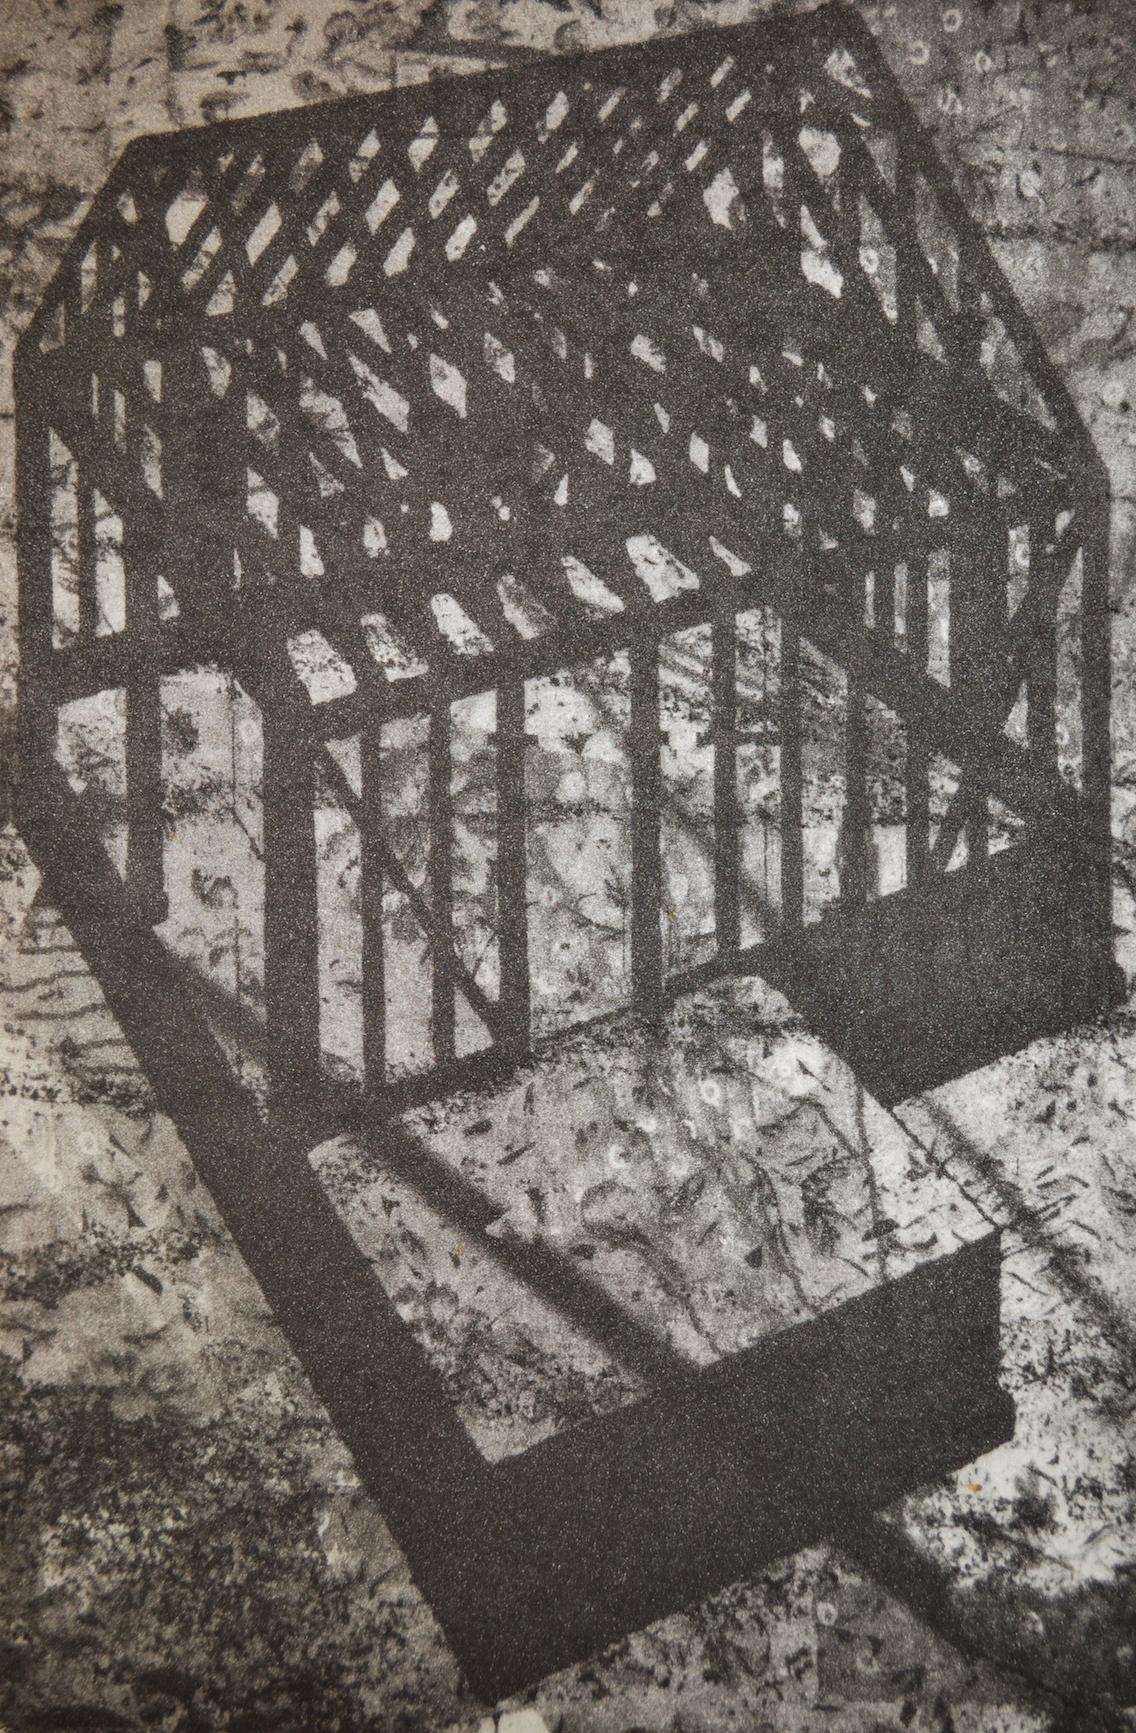 "Home, 9 x 6"", photogravure, 2013"